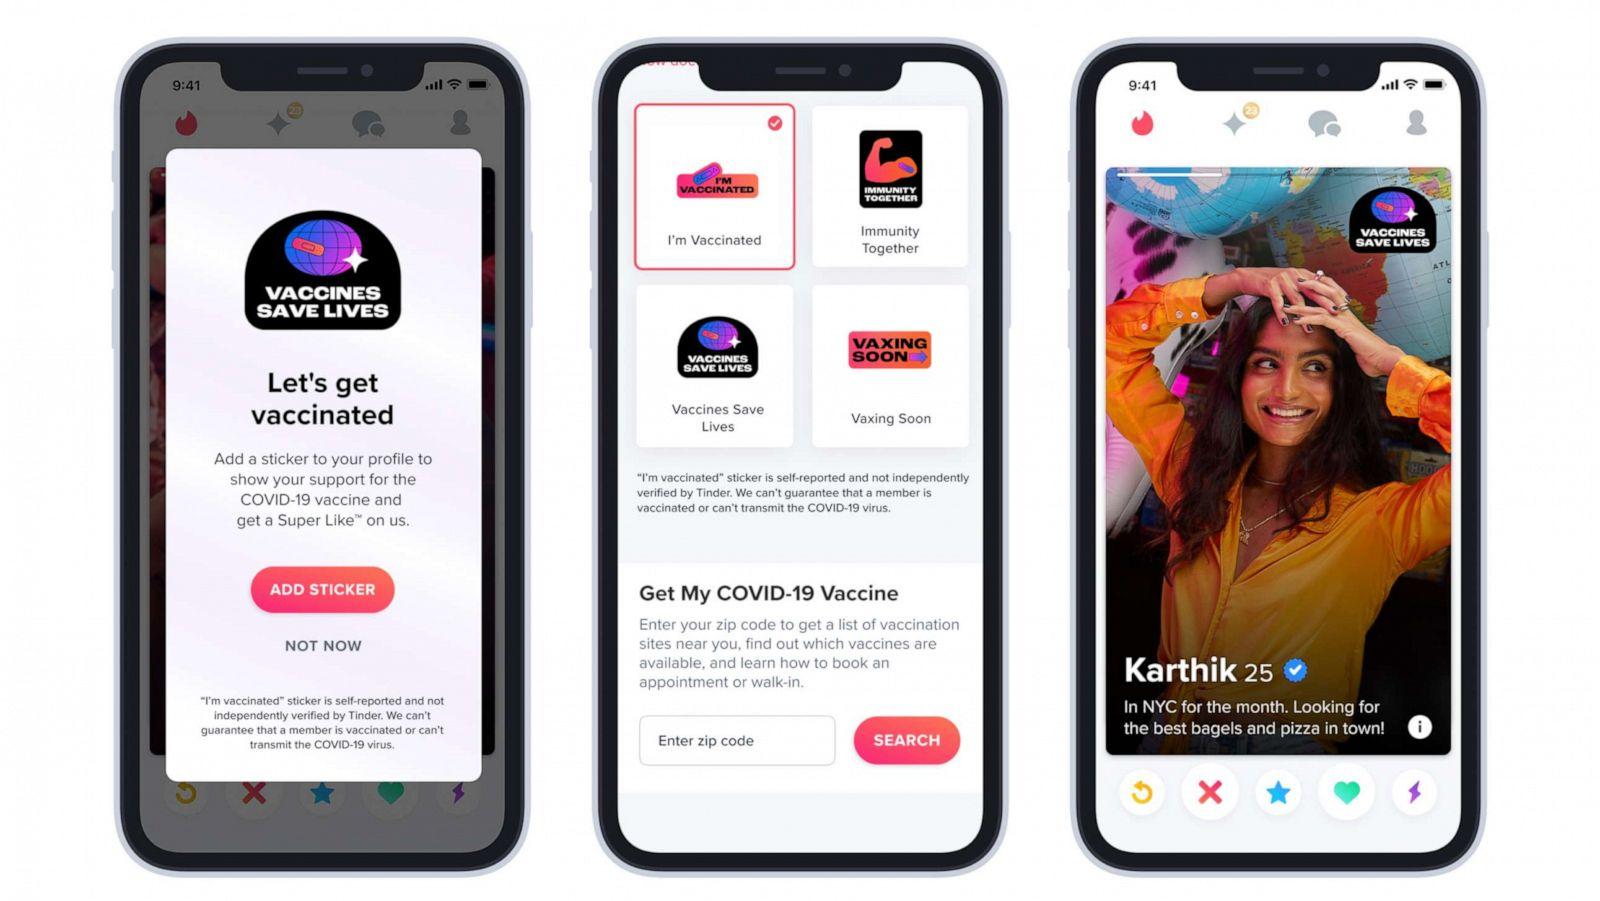 Hinge app is what dating Hinge: Dating